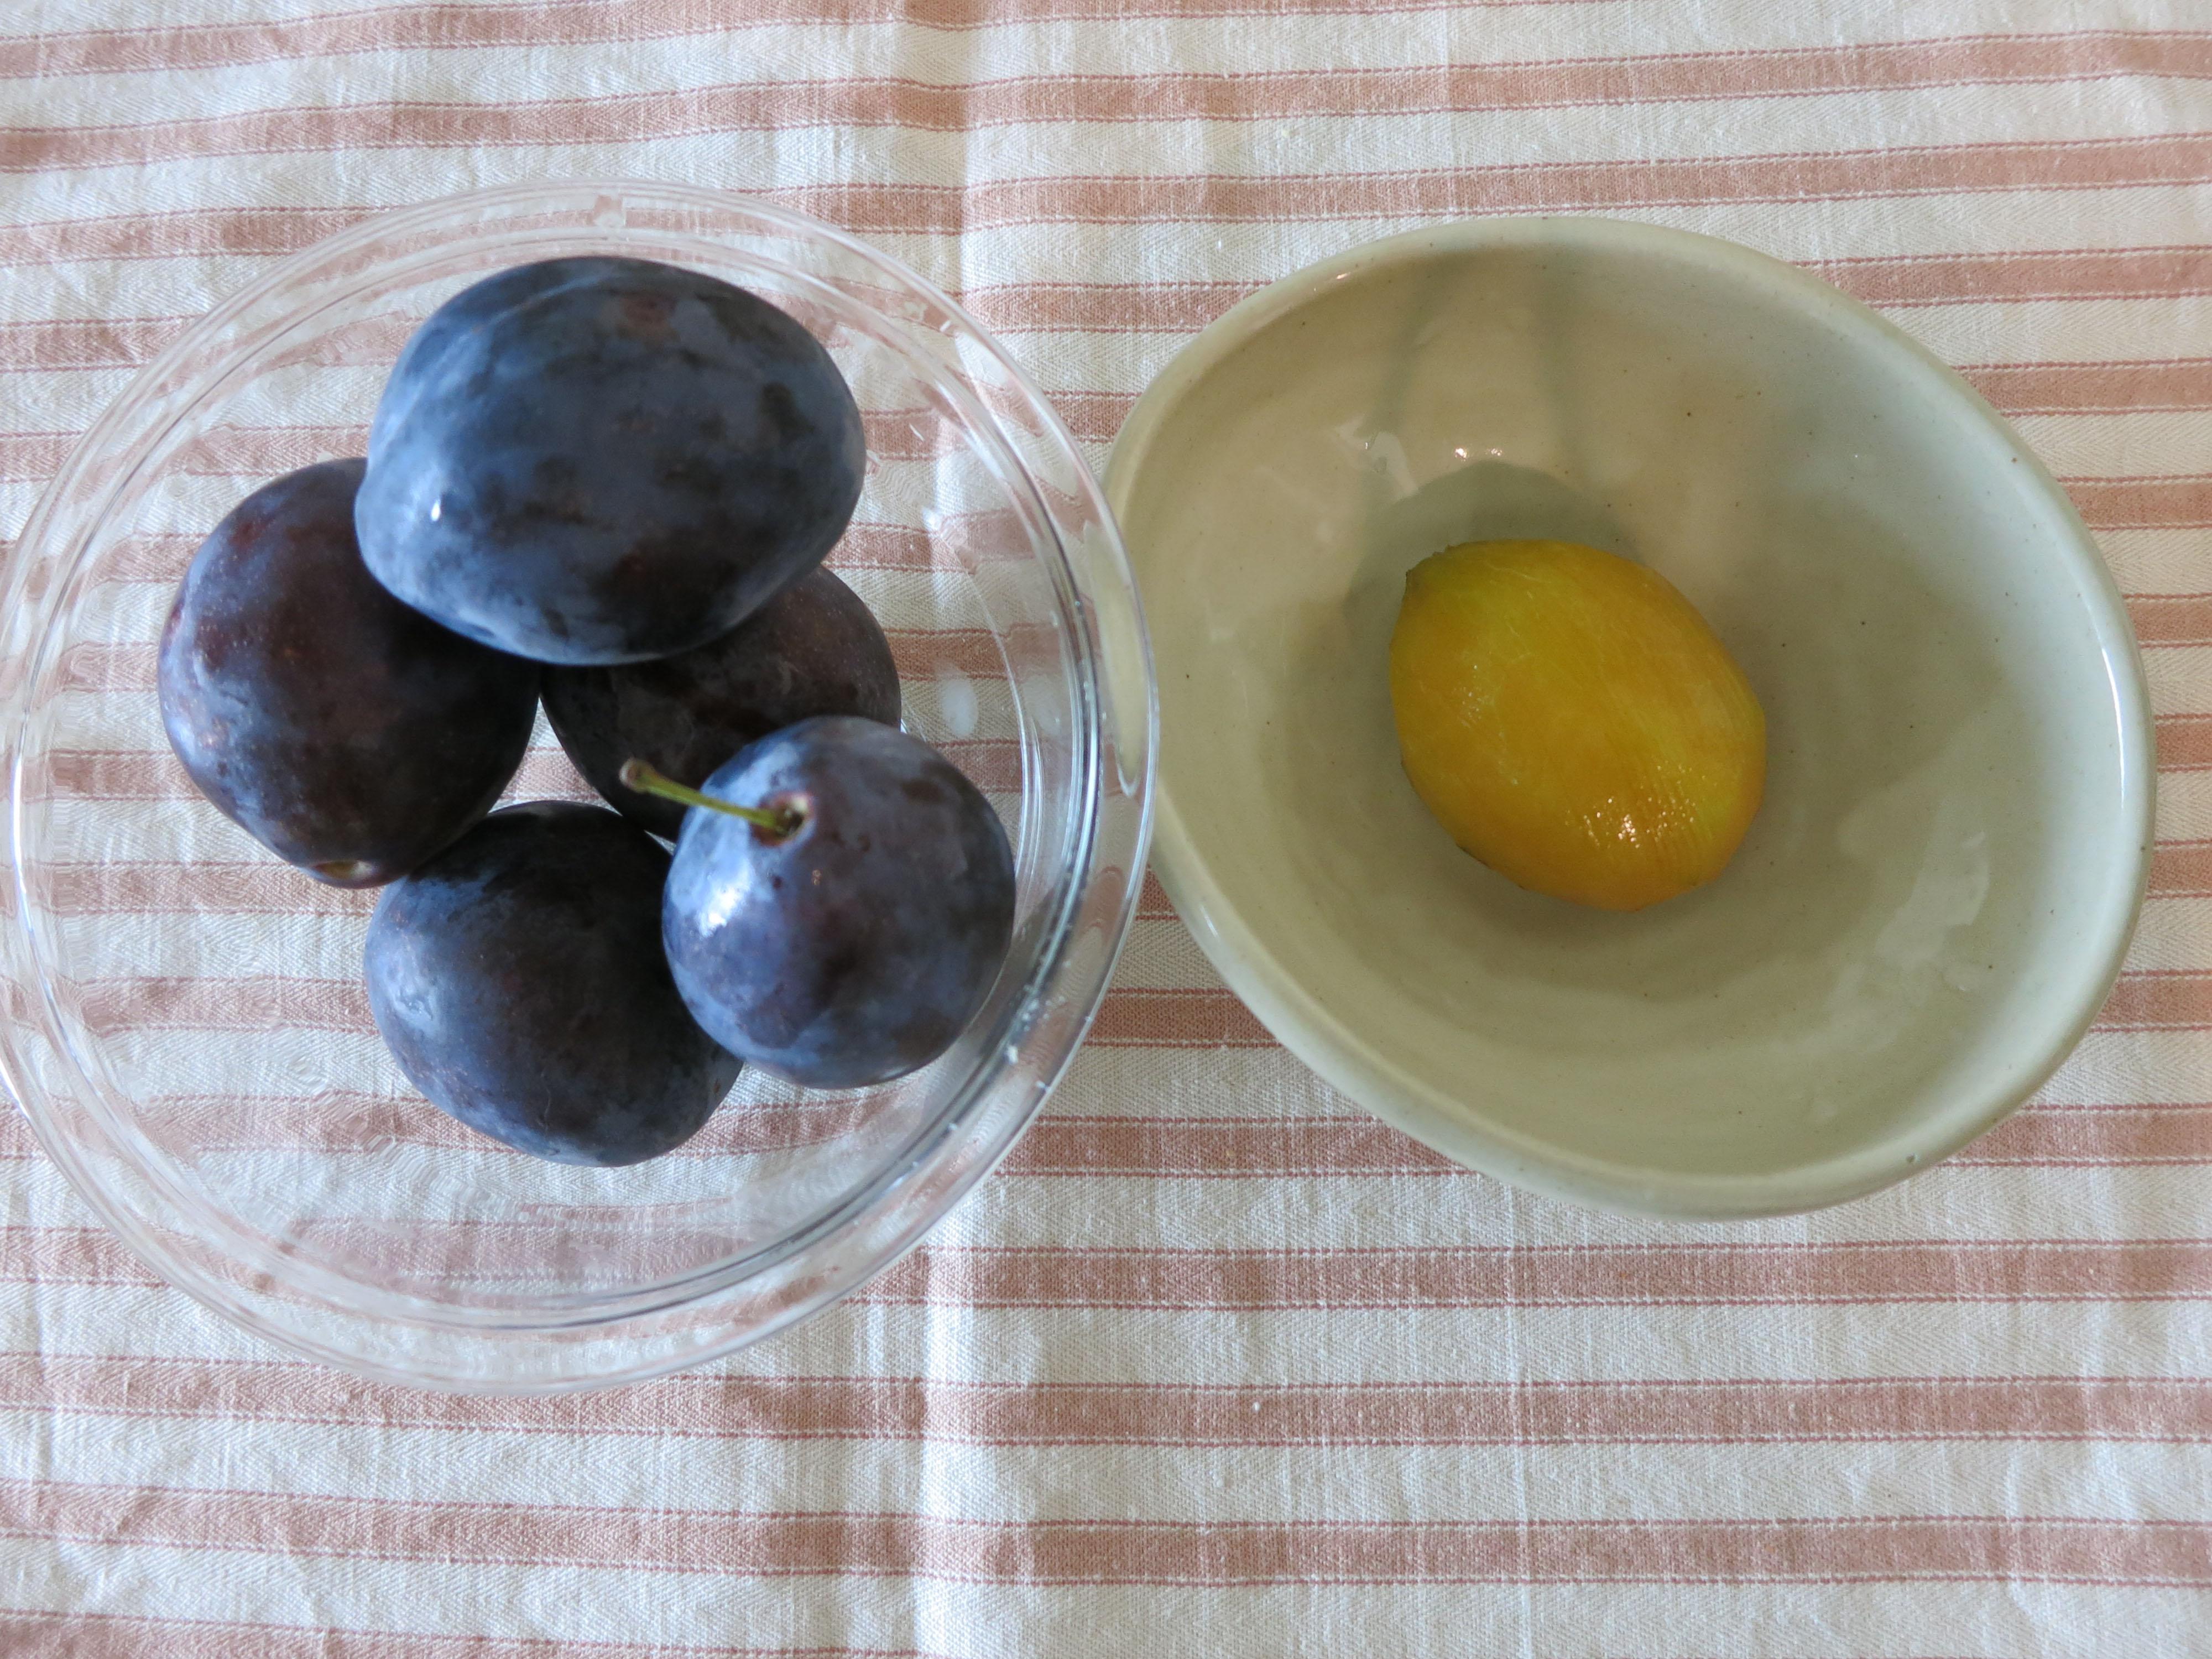 fruits_2322.jpg